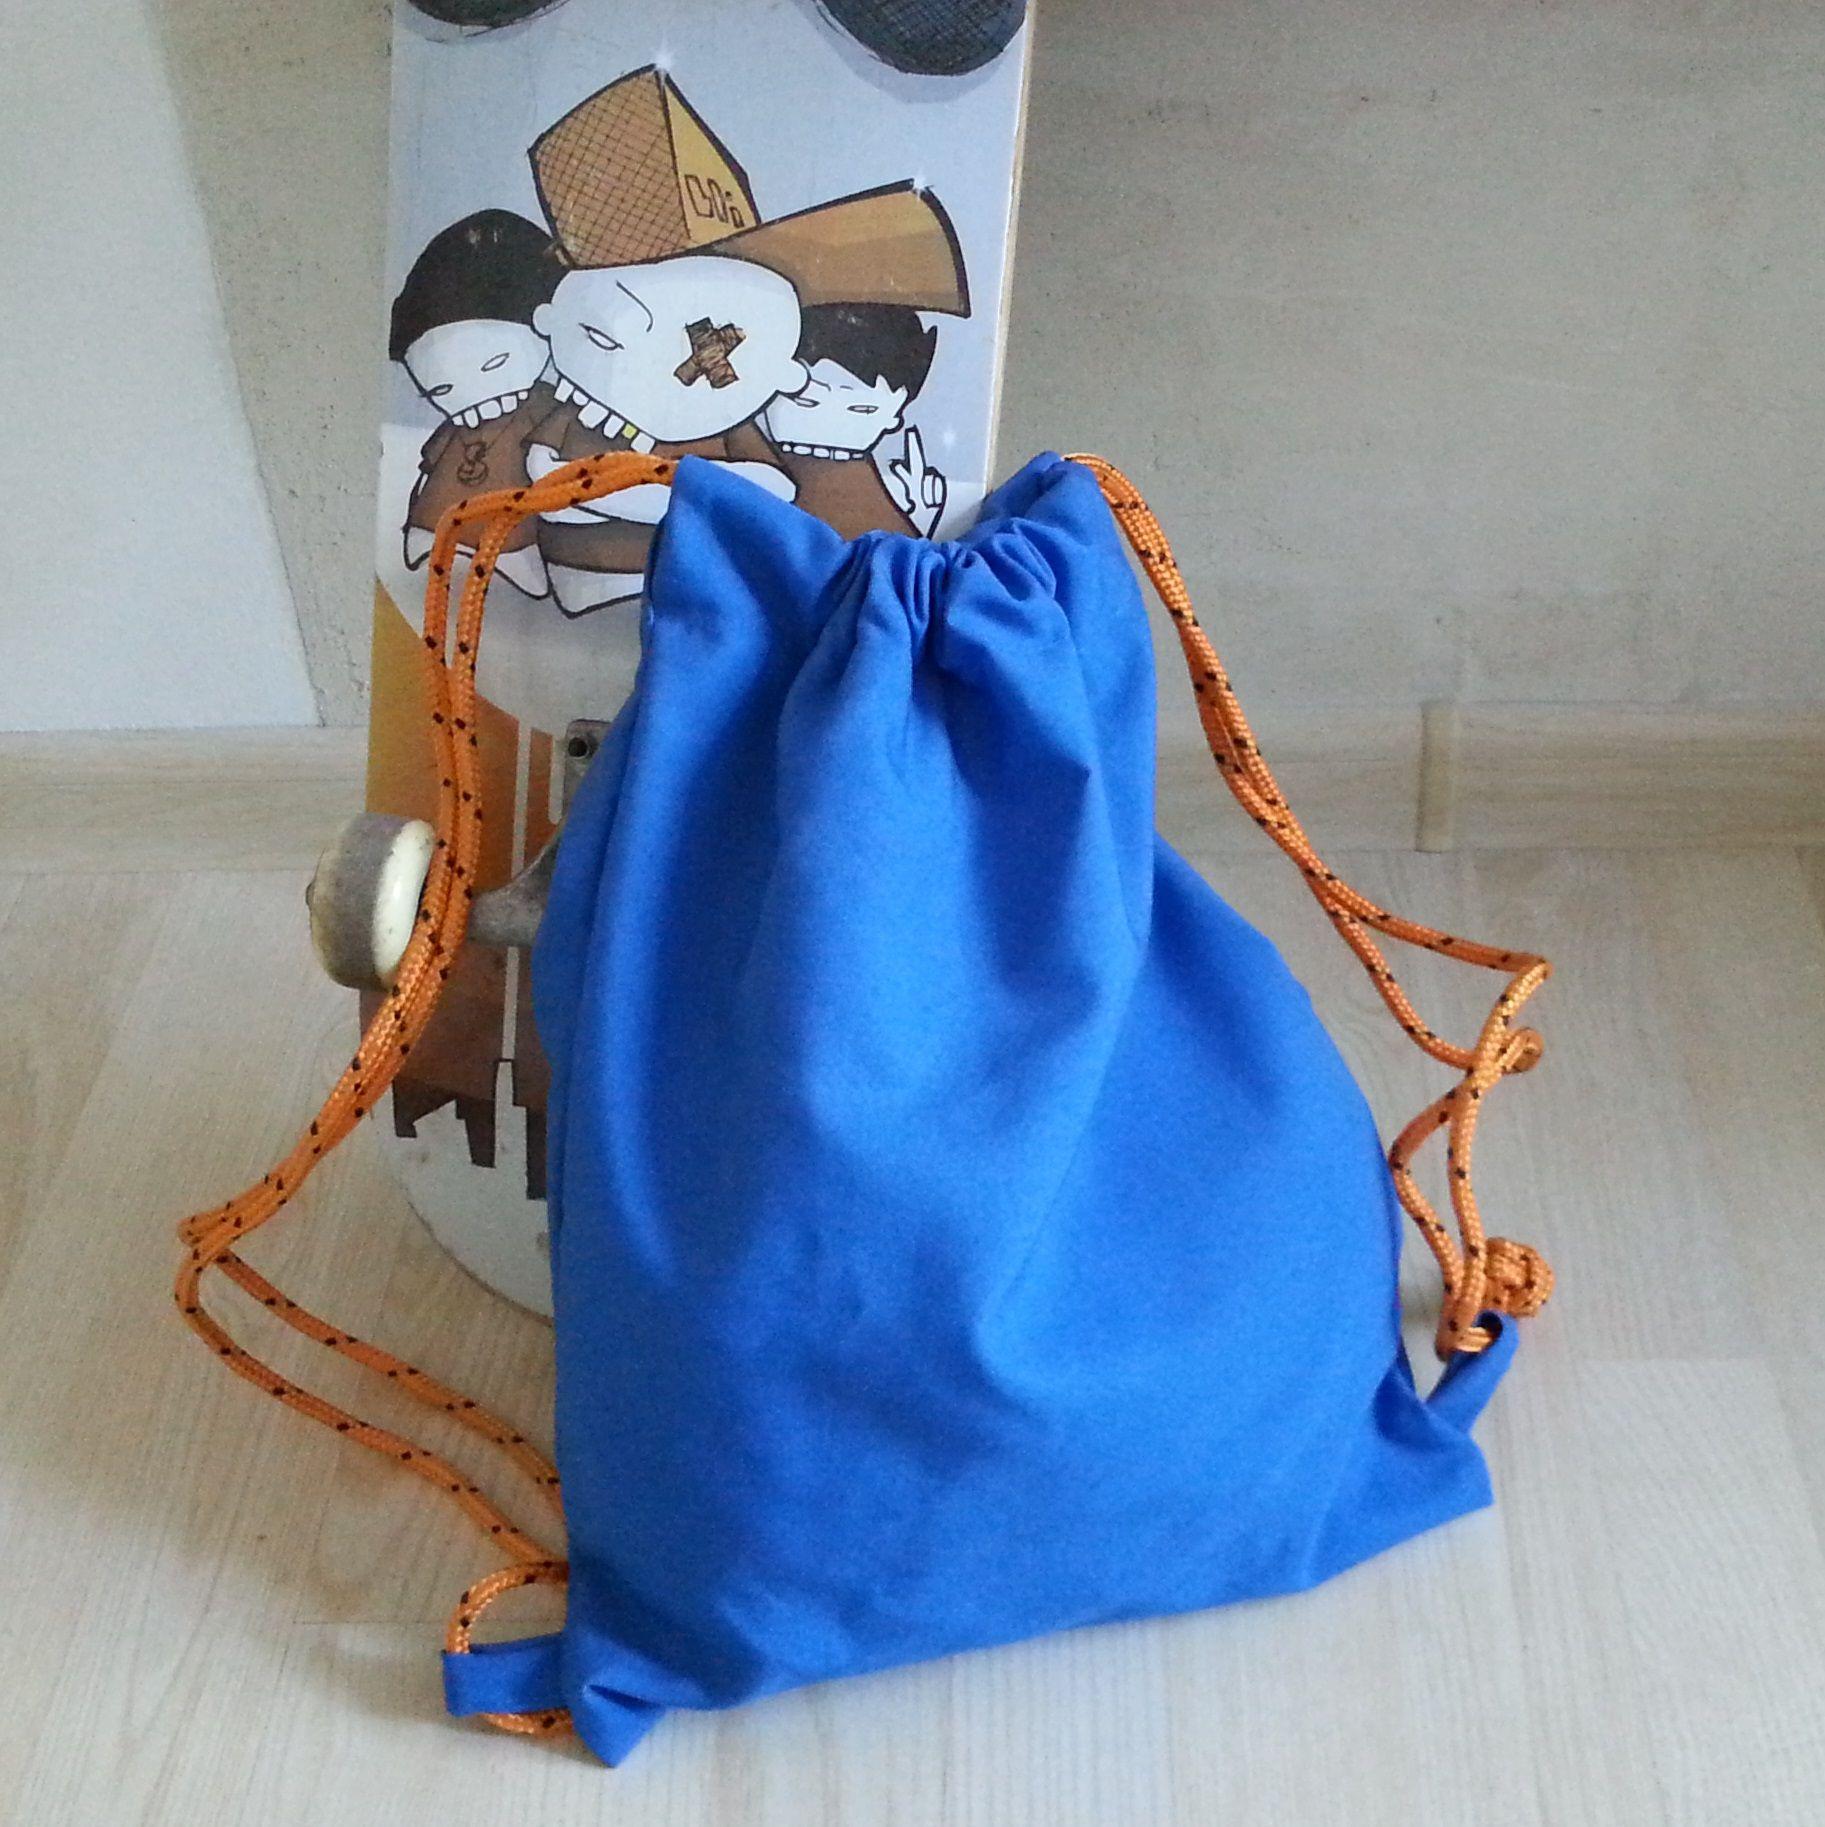 Bag For Shoes Worek Na Buty Bags Bucket Bag Diy